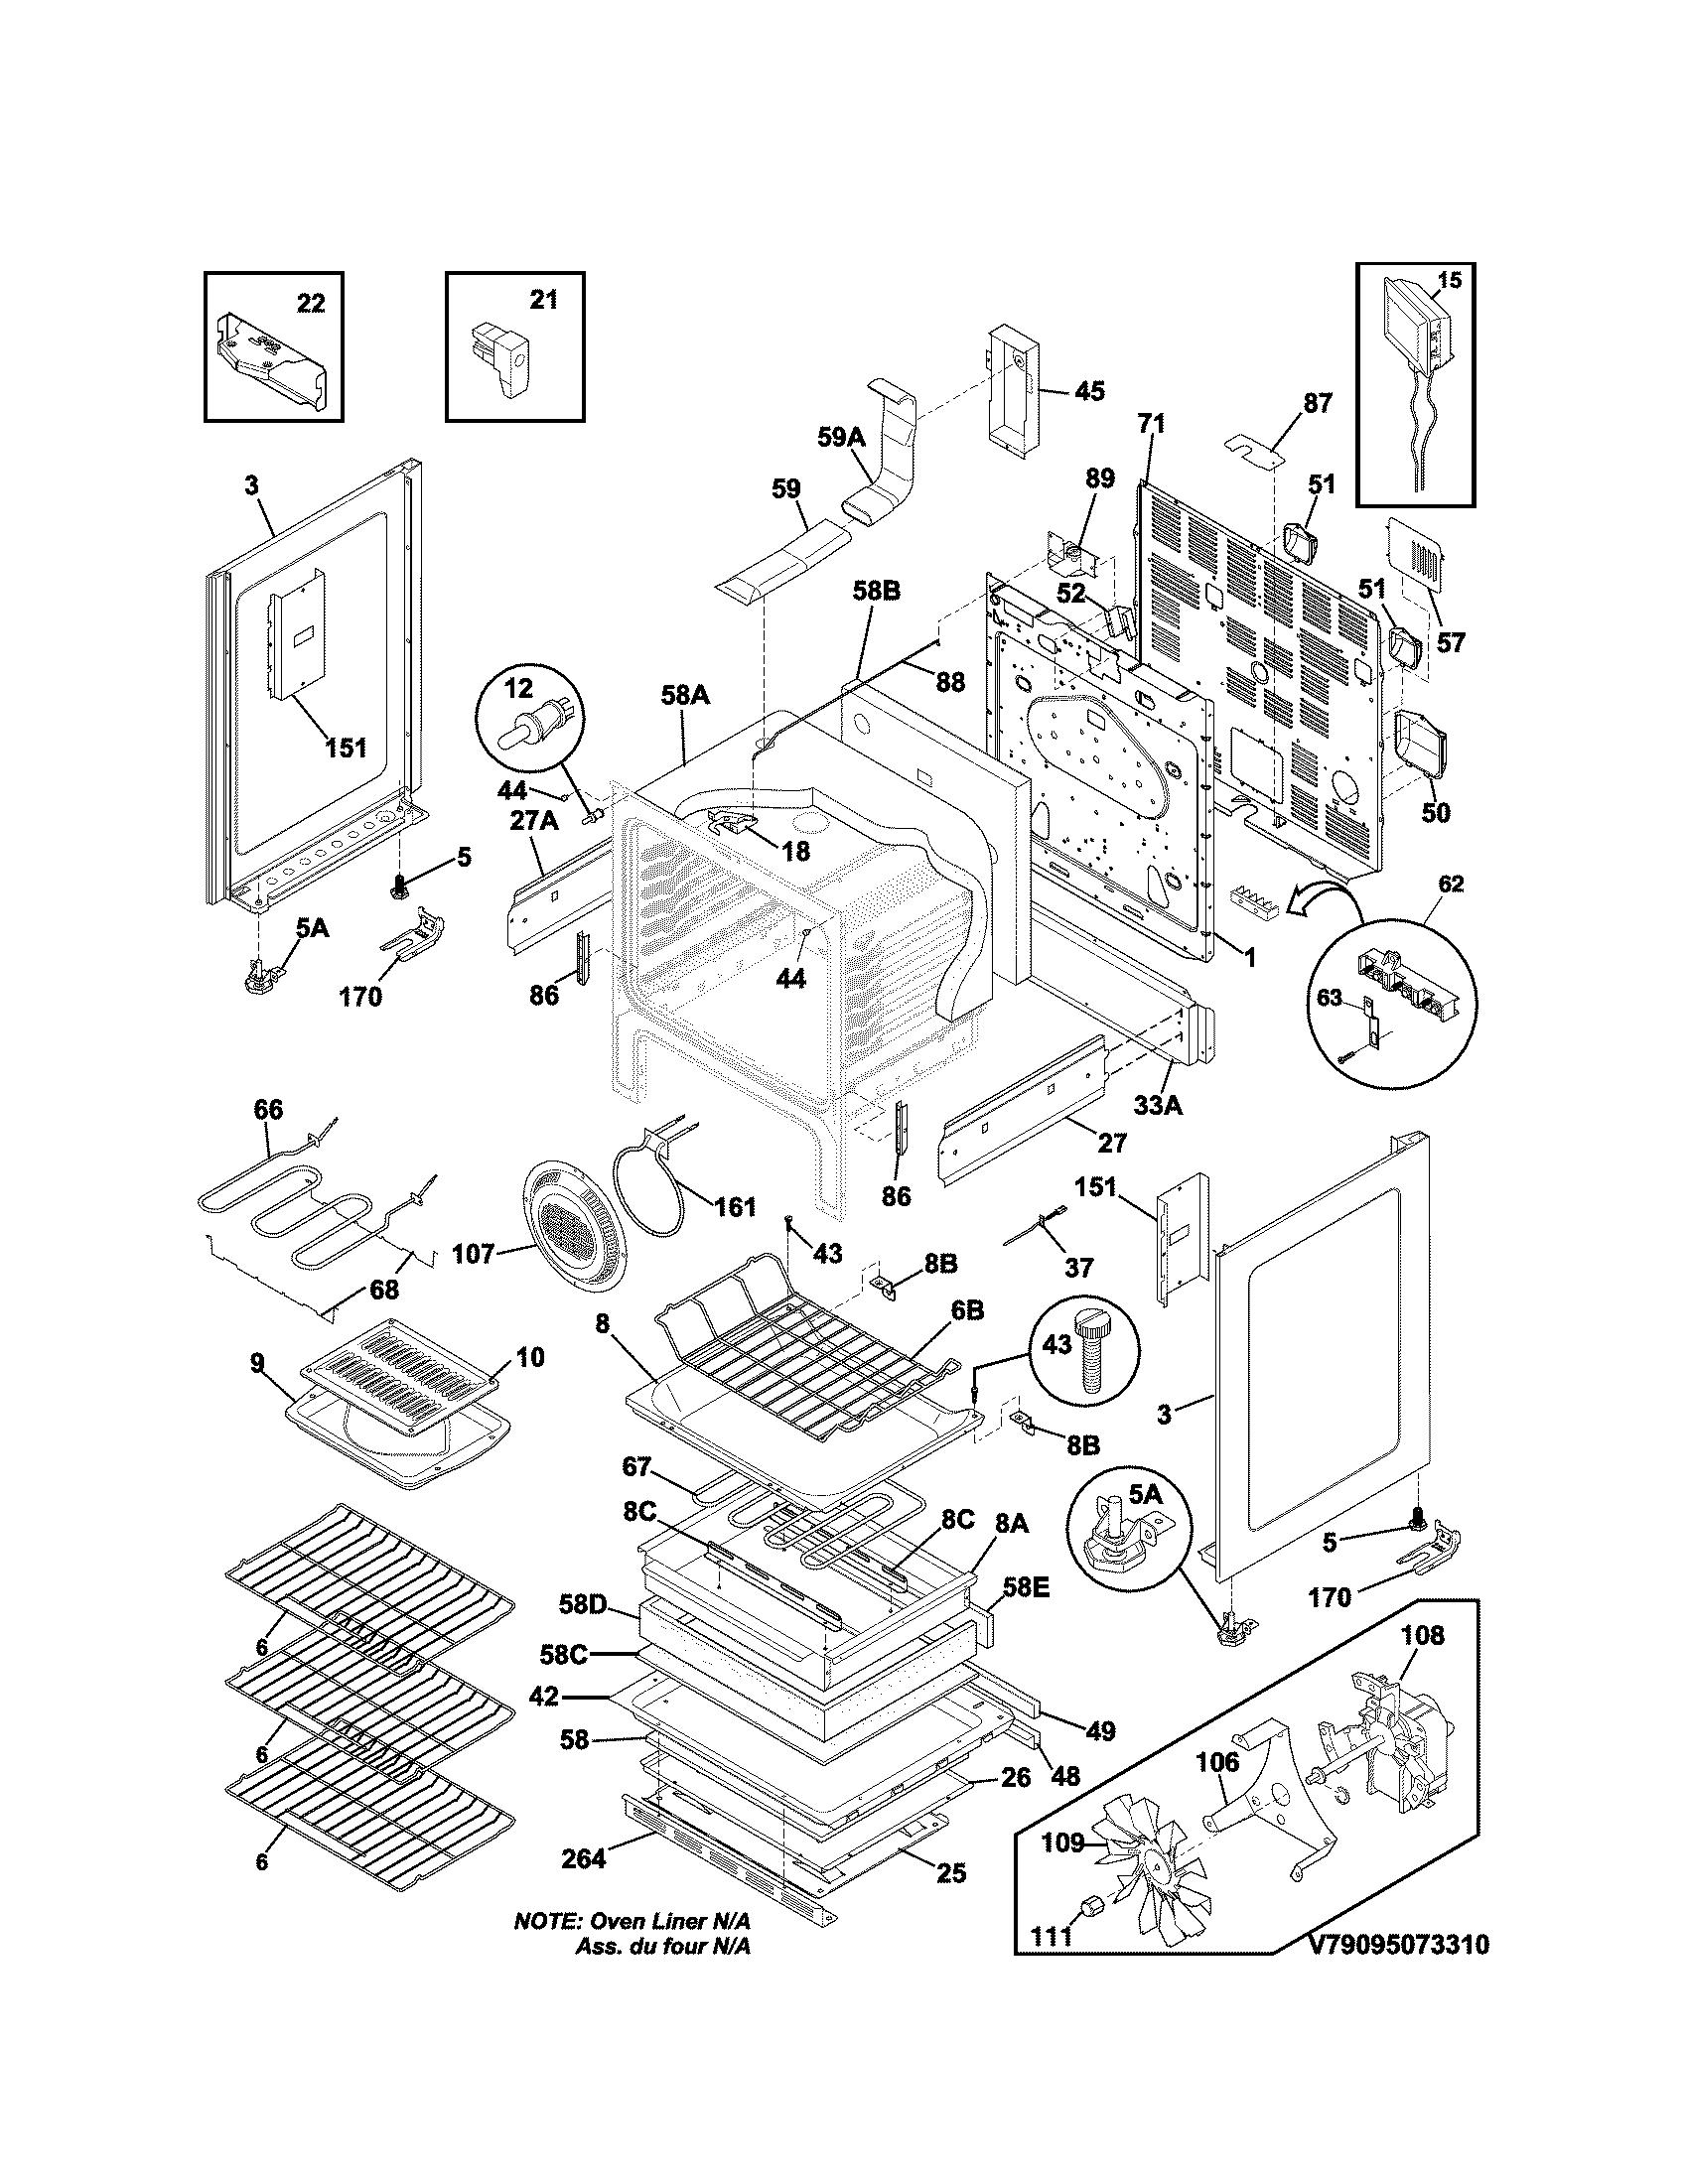 Old fuse box diagram wiring diagram